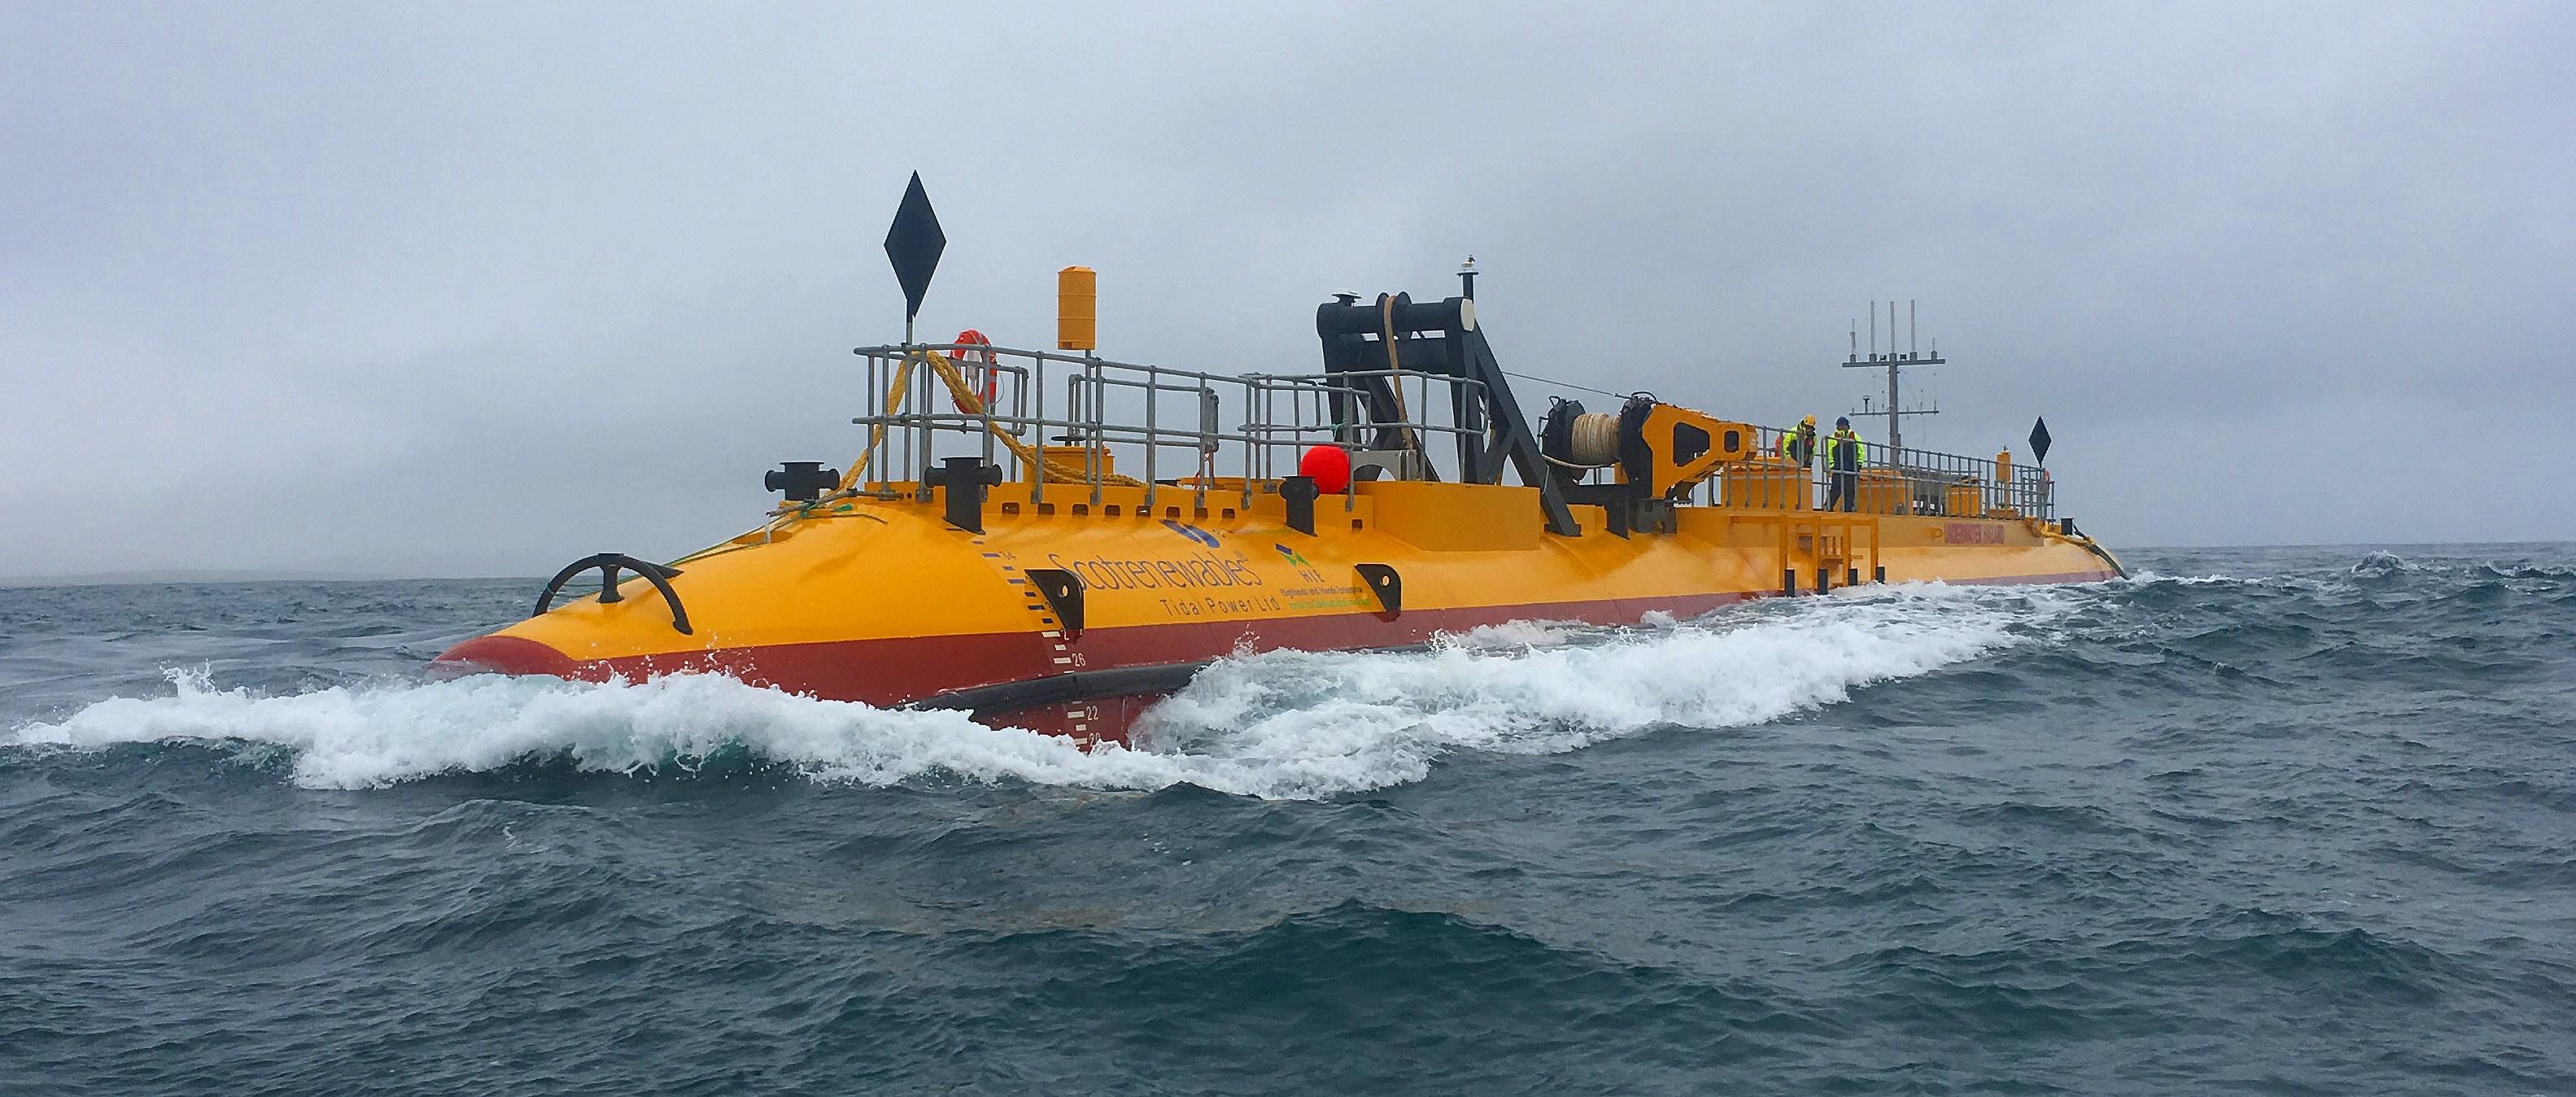 tidal turbine, tidal power, sr2000, renewable enerfy